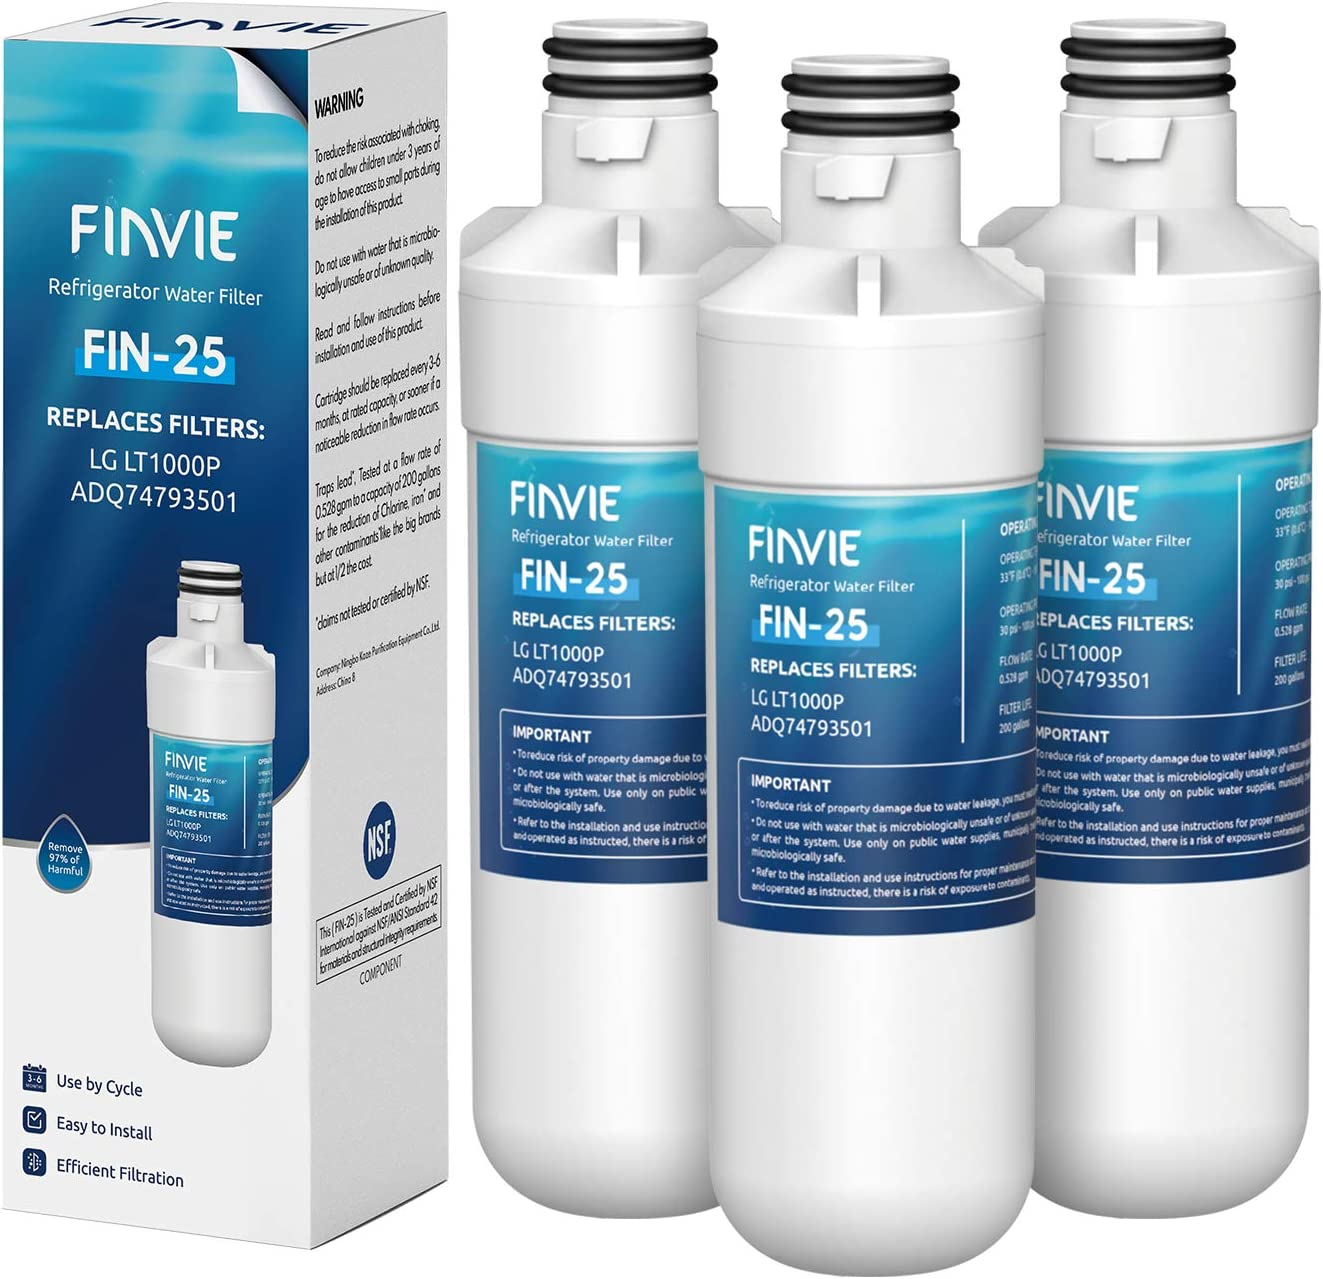 FINVIE LT1000p Refrigerator Water Filter, Compatible with LG LT1000P, LT1000PC, LT-1000PC, ADQ74793501, ADQ74793502, MDJ64844601, Kenmore 469980, LMXS28626S, 3 Pack